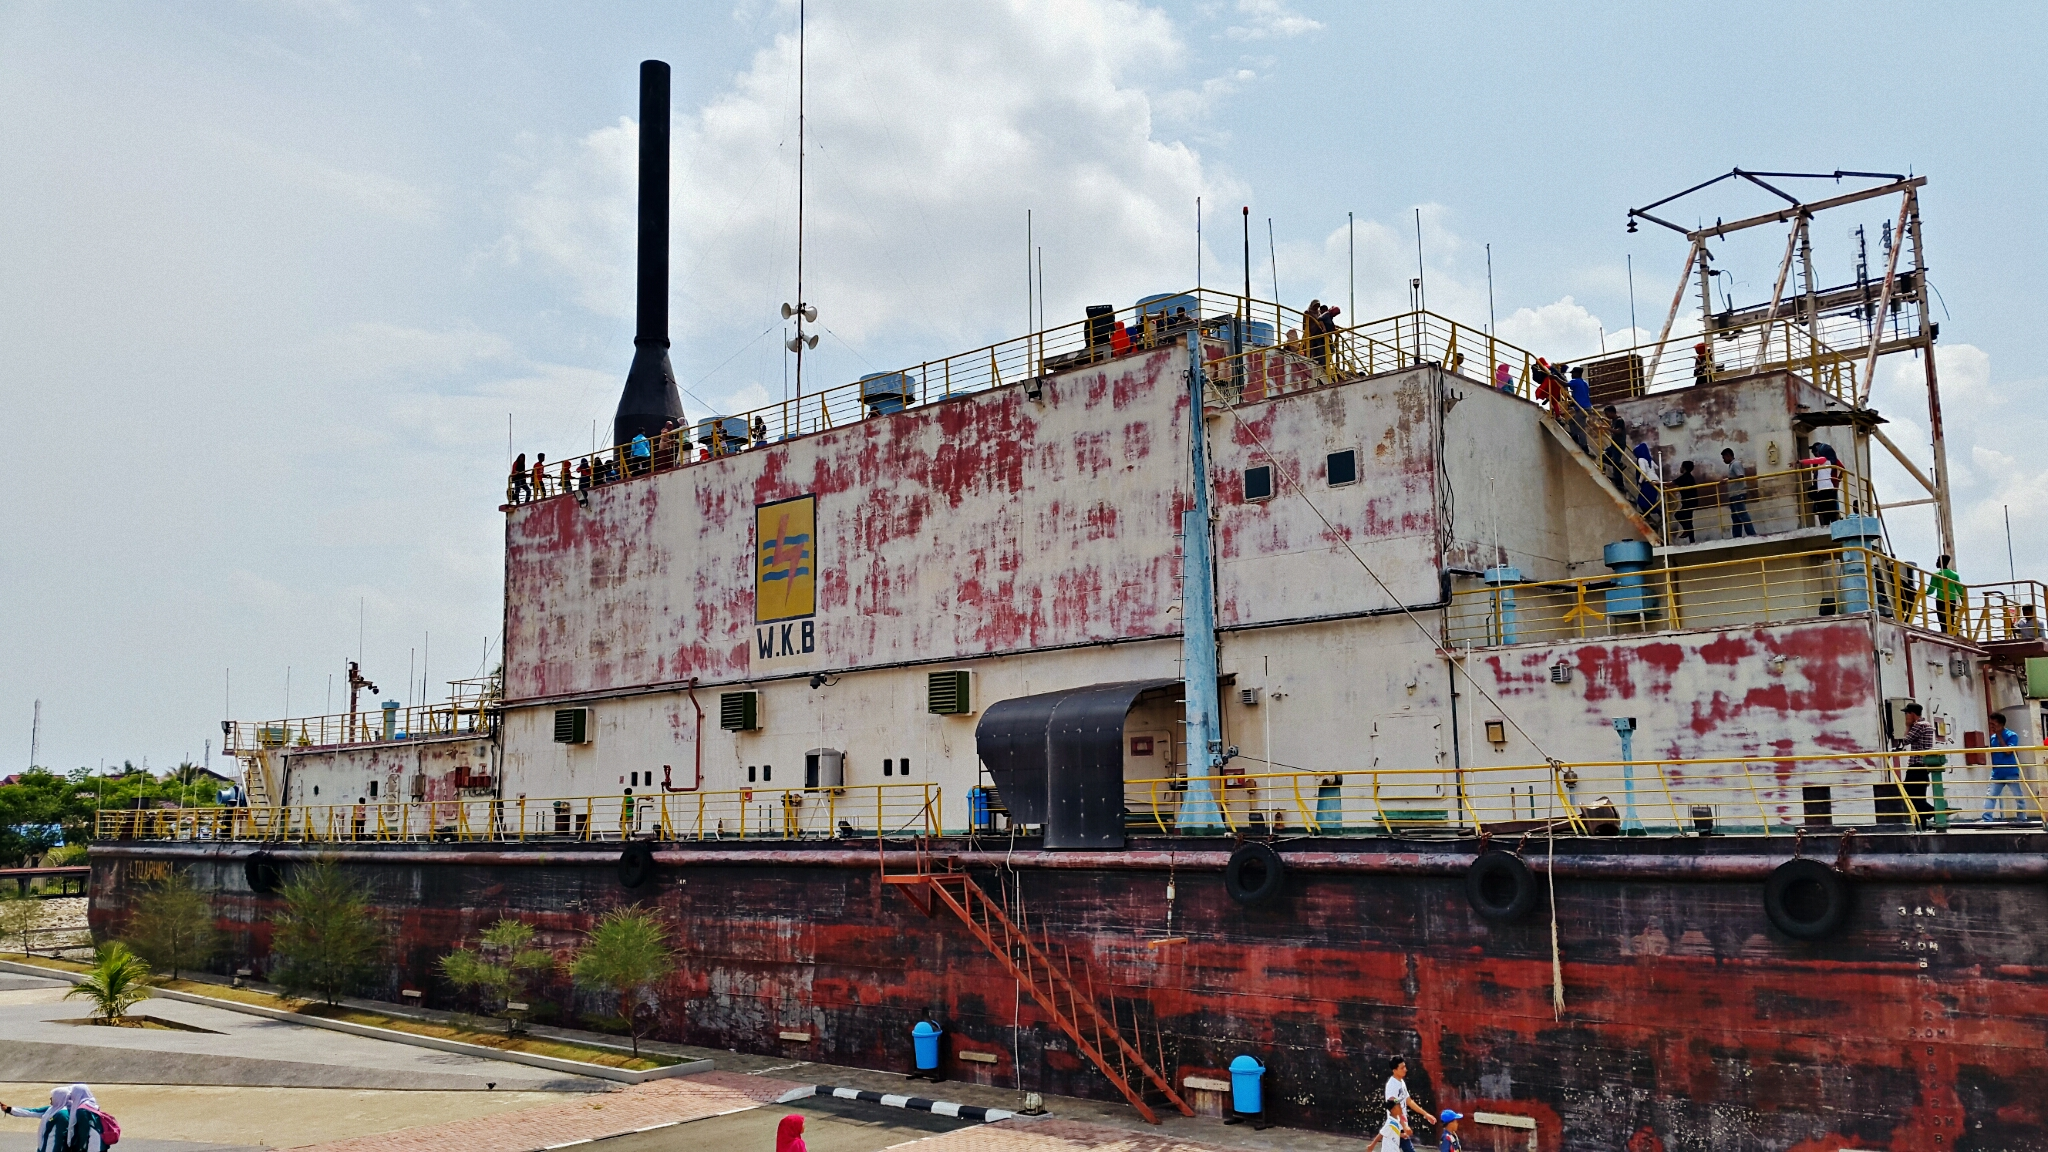 Menginjakkan Kaki Ujung Barat Indonesiatravellietravellie Nggak Ketinggalan Banda Aceh Tentu